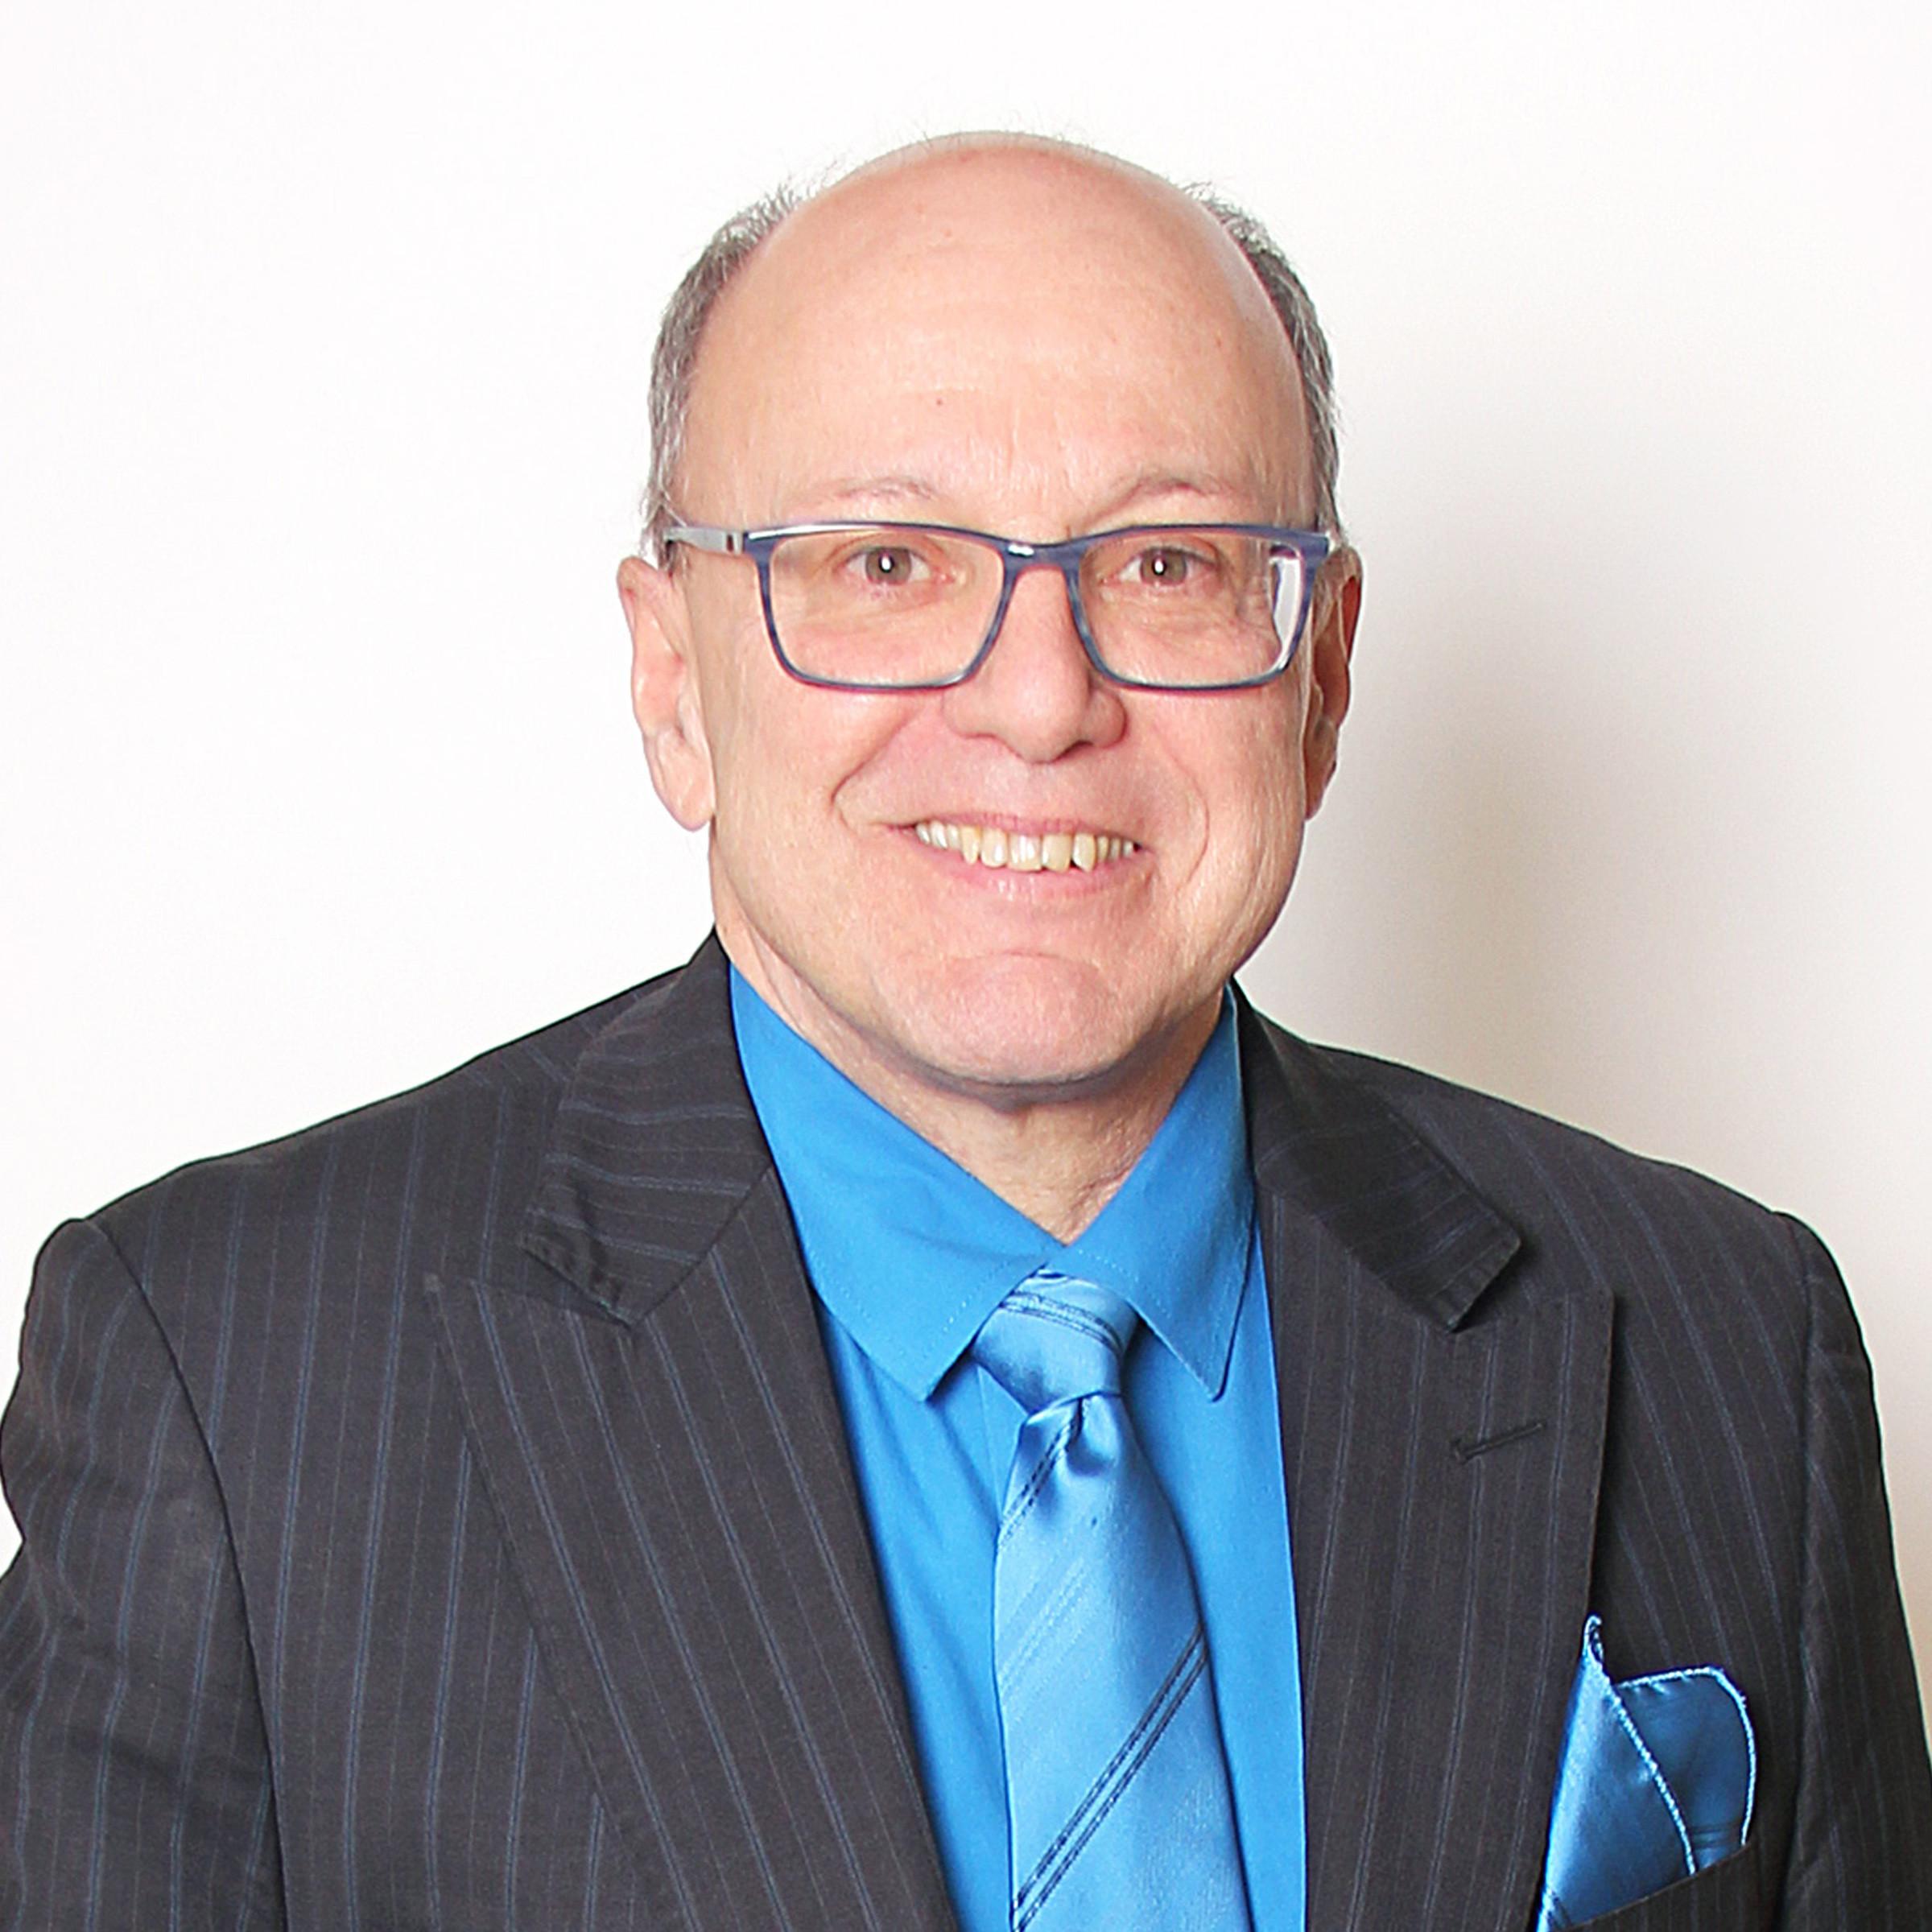 Yvon Moreau